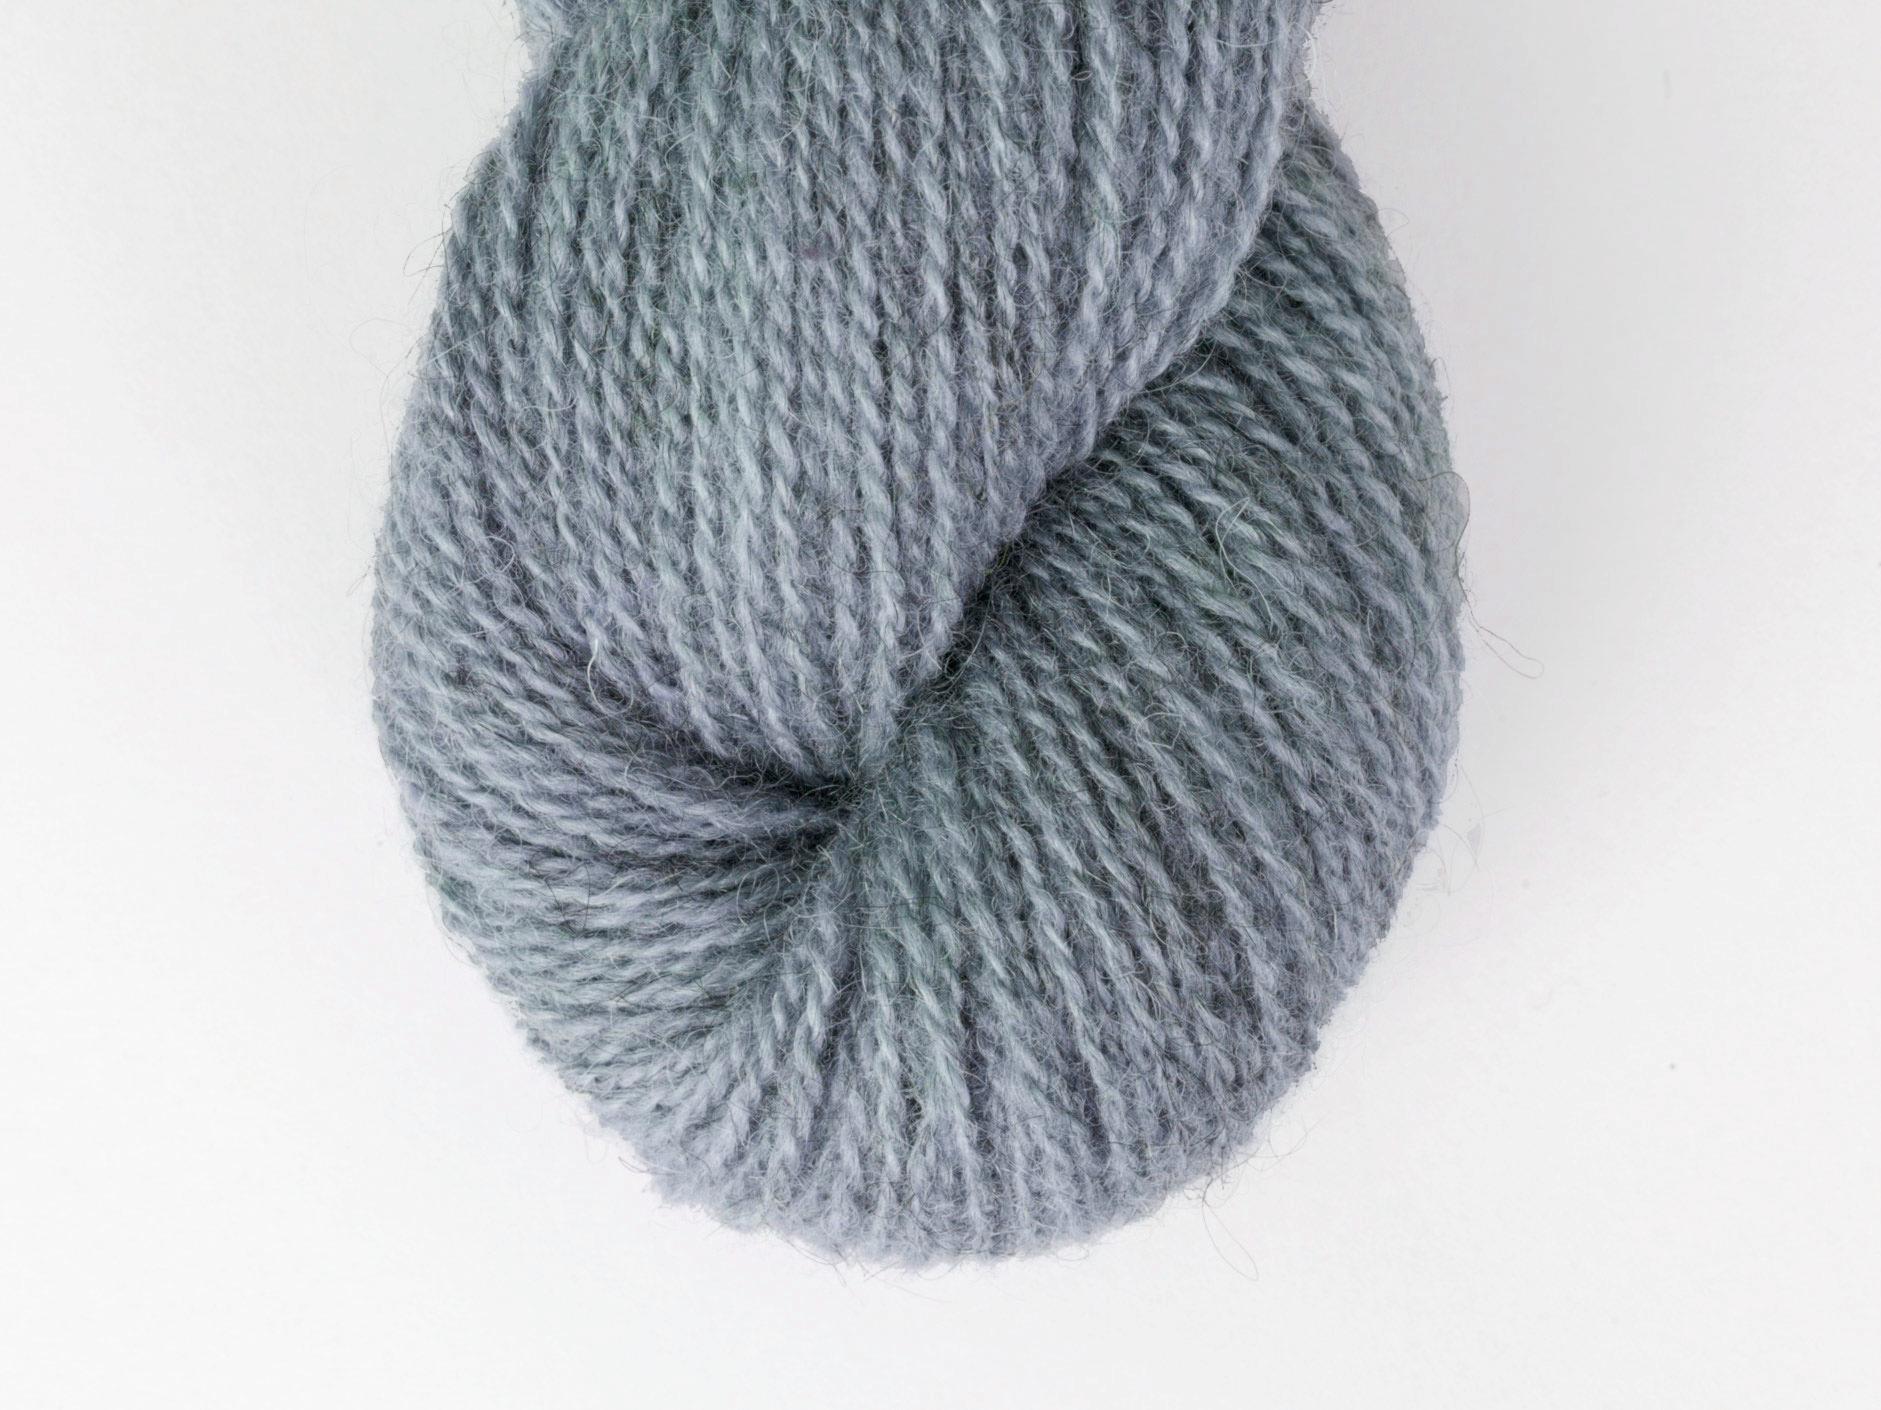 Bohus Stickning garn yarn BS wool 10 blue-gray